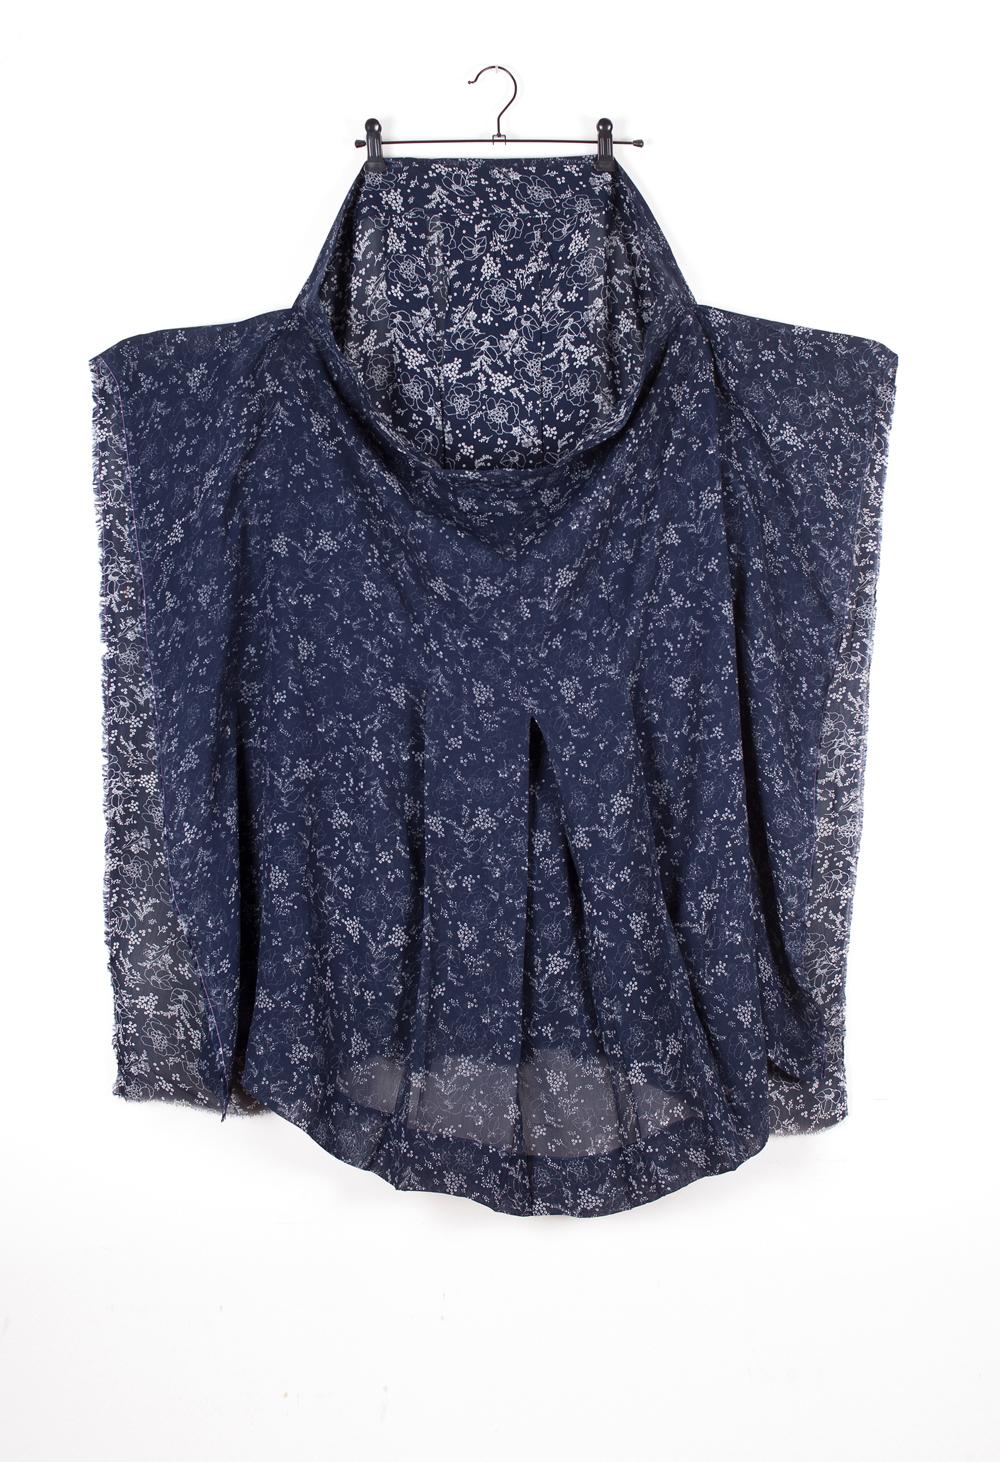 DRESS CRISIS collection Navy Flower Emerging Disappearing Skirt #dressltd